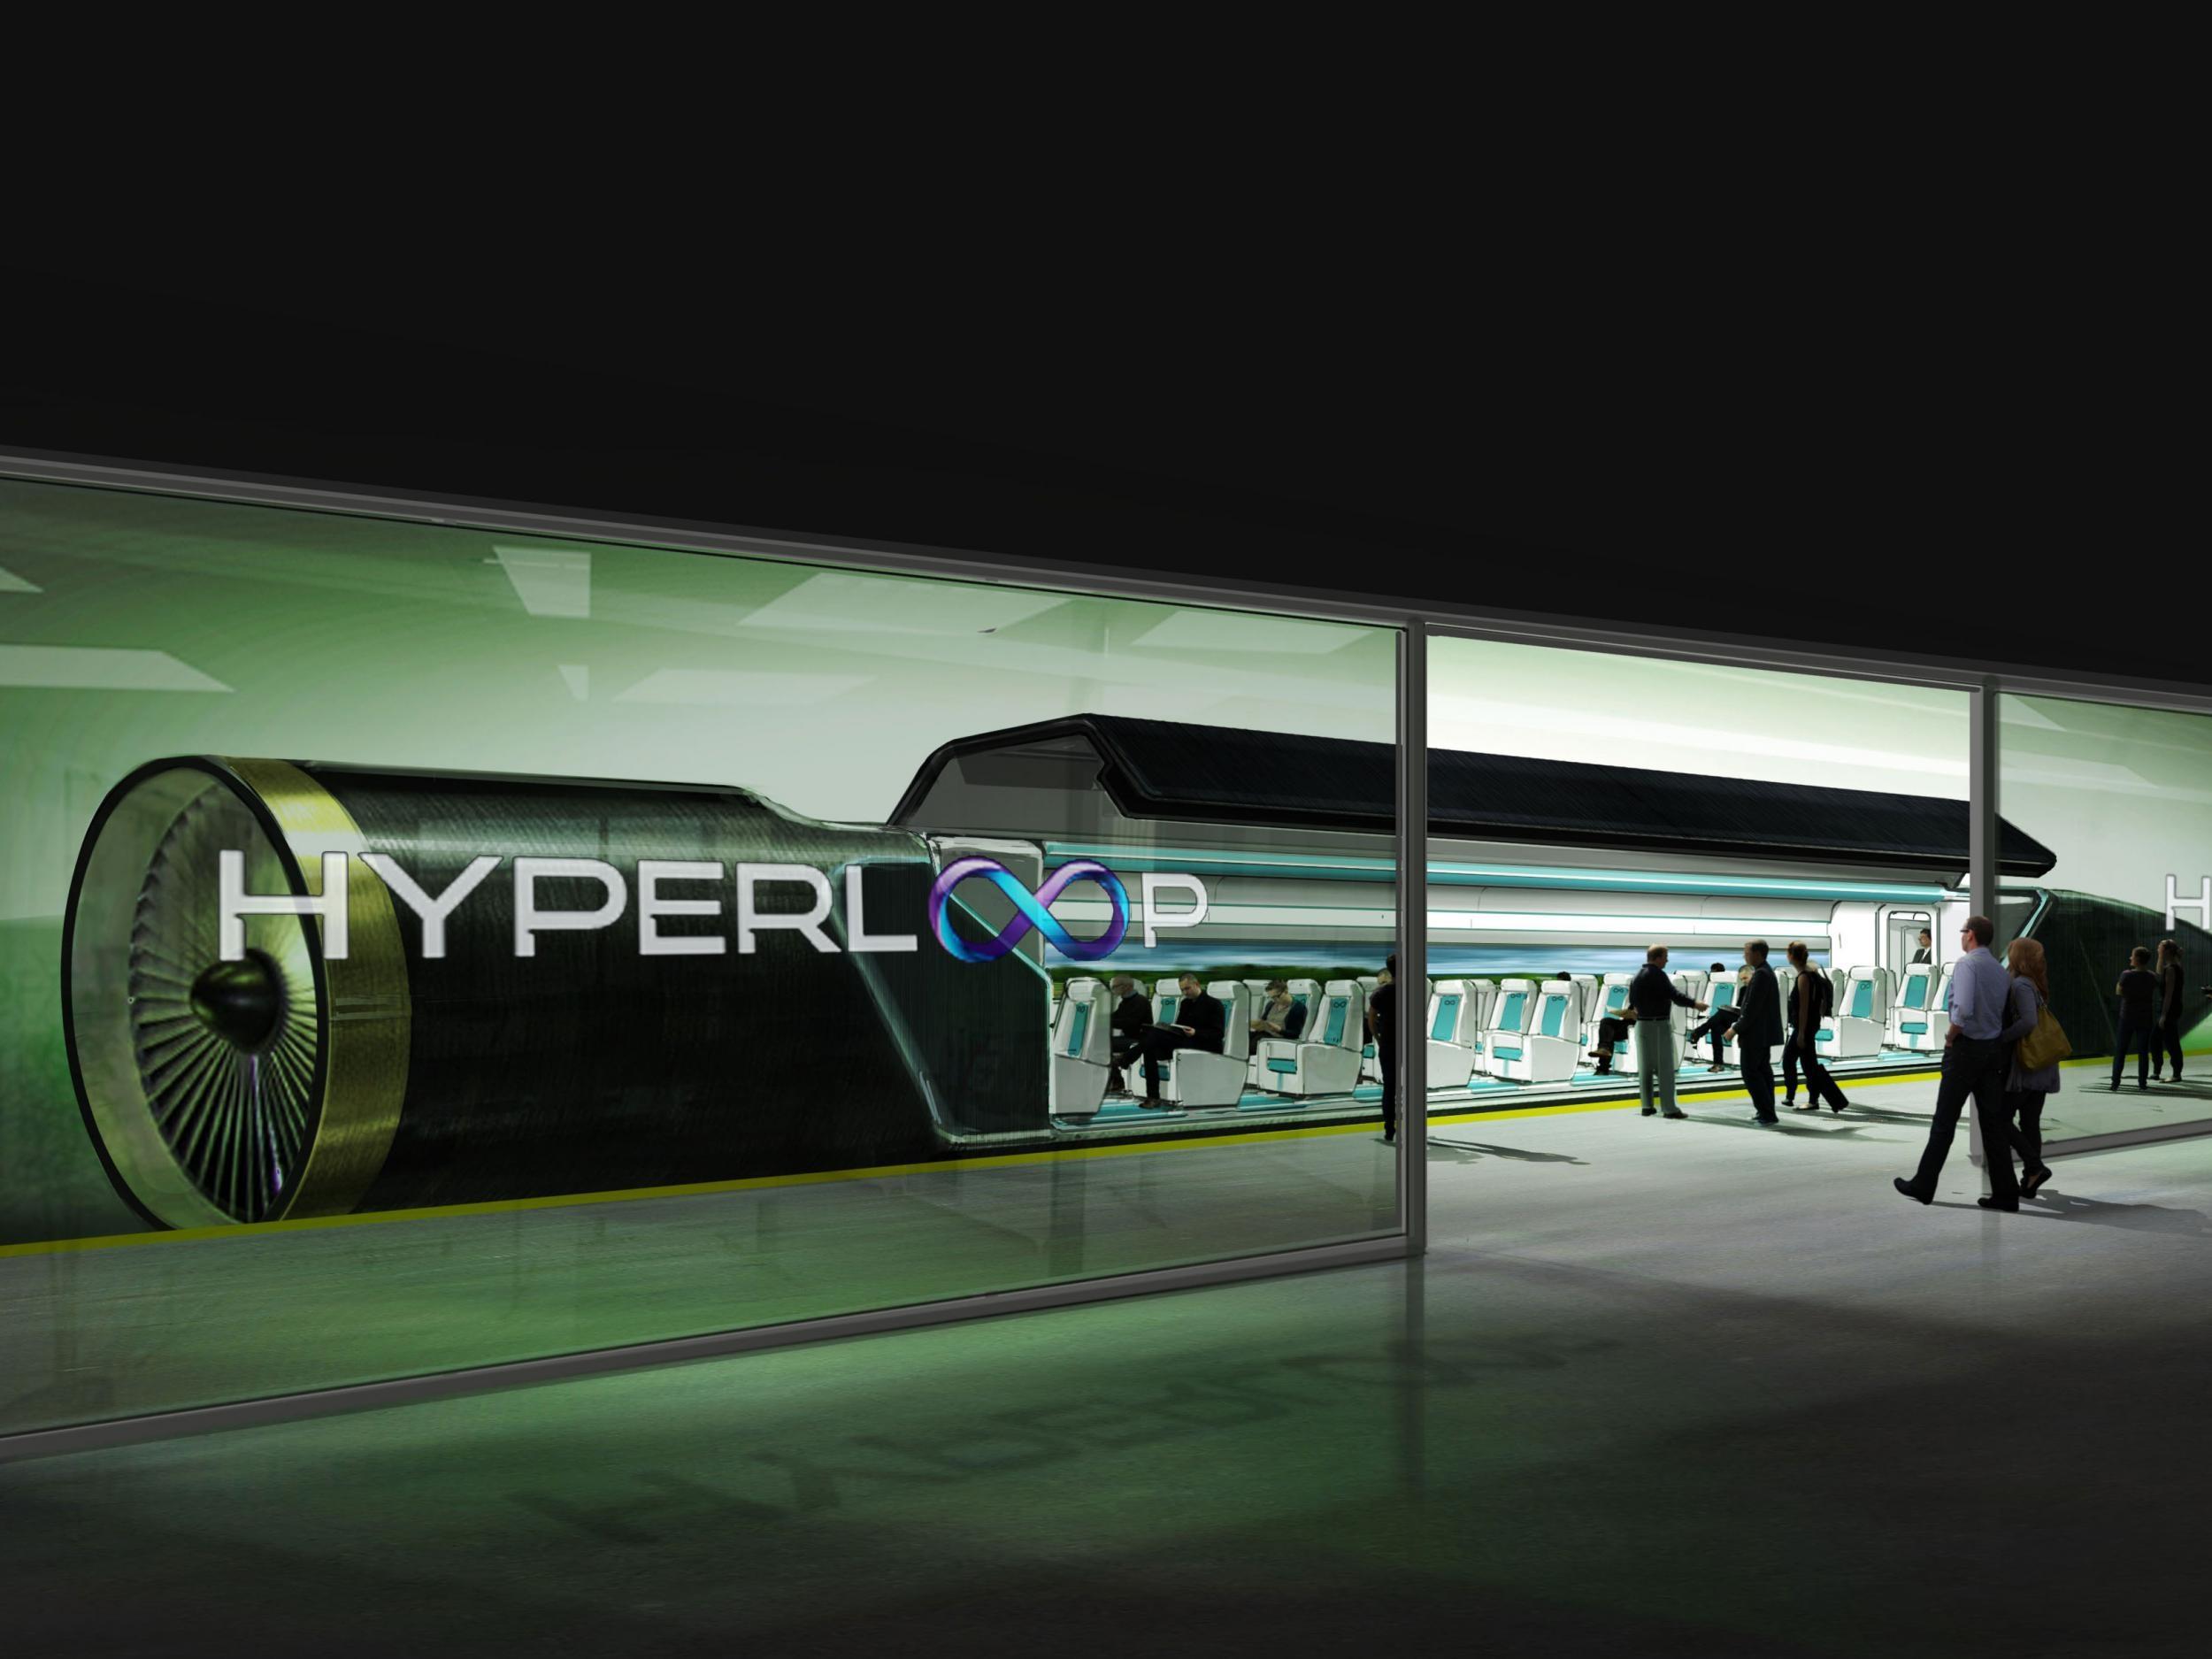 Hyperloop превзошел все ожидания разработчиков